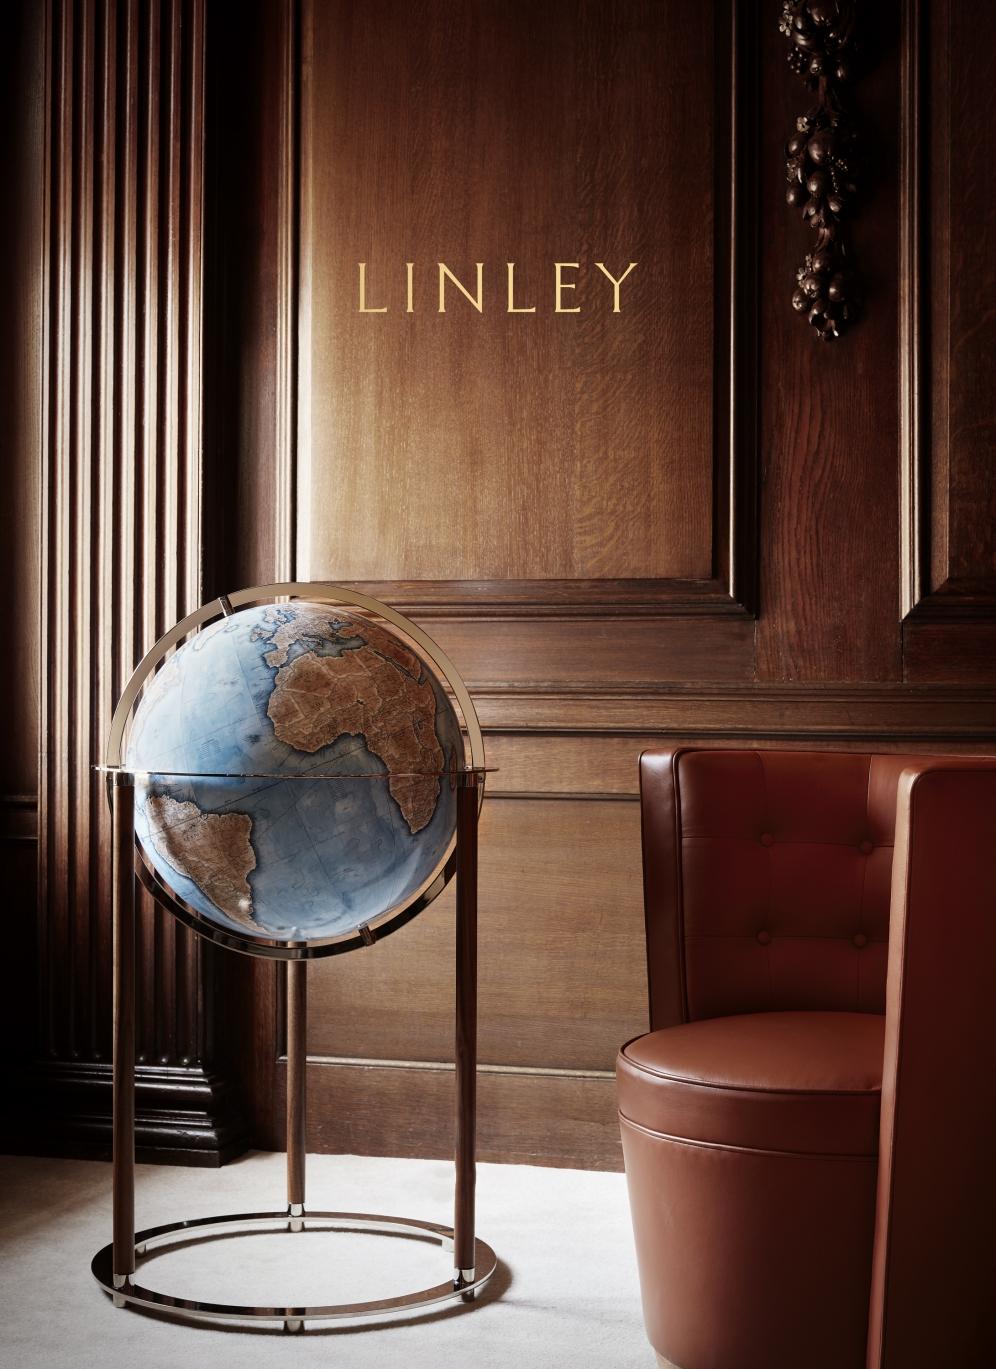 Linley